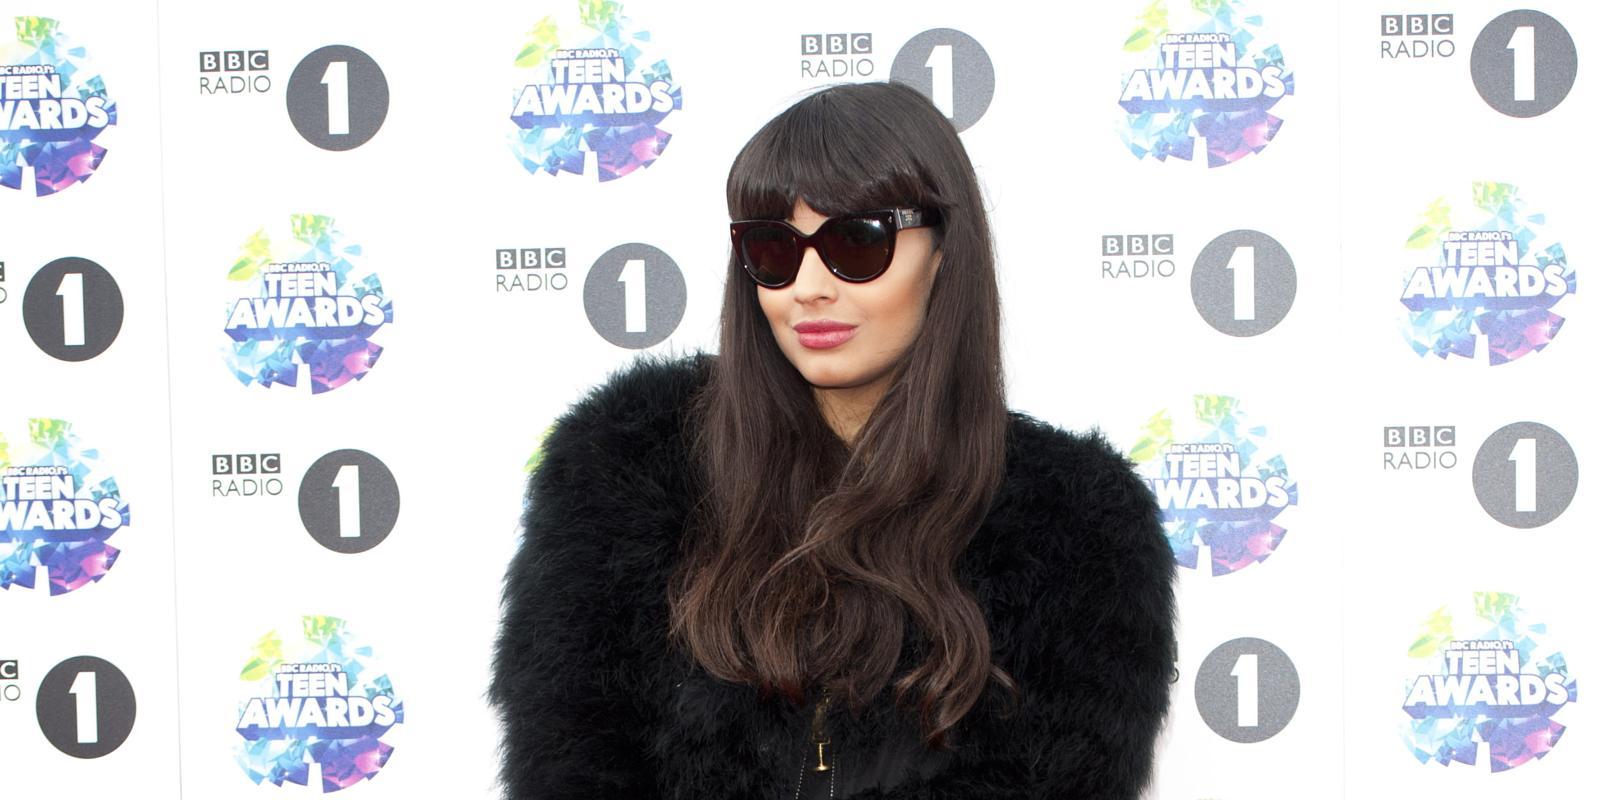 miley cyrus fans 'sent death threats' to bbc radio 1's jameela jamil